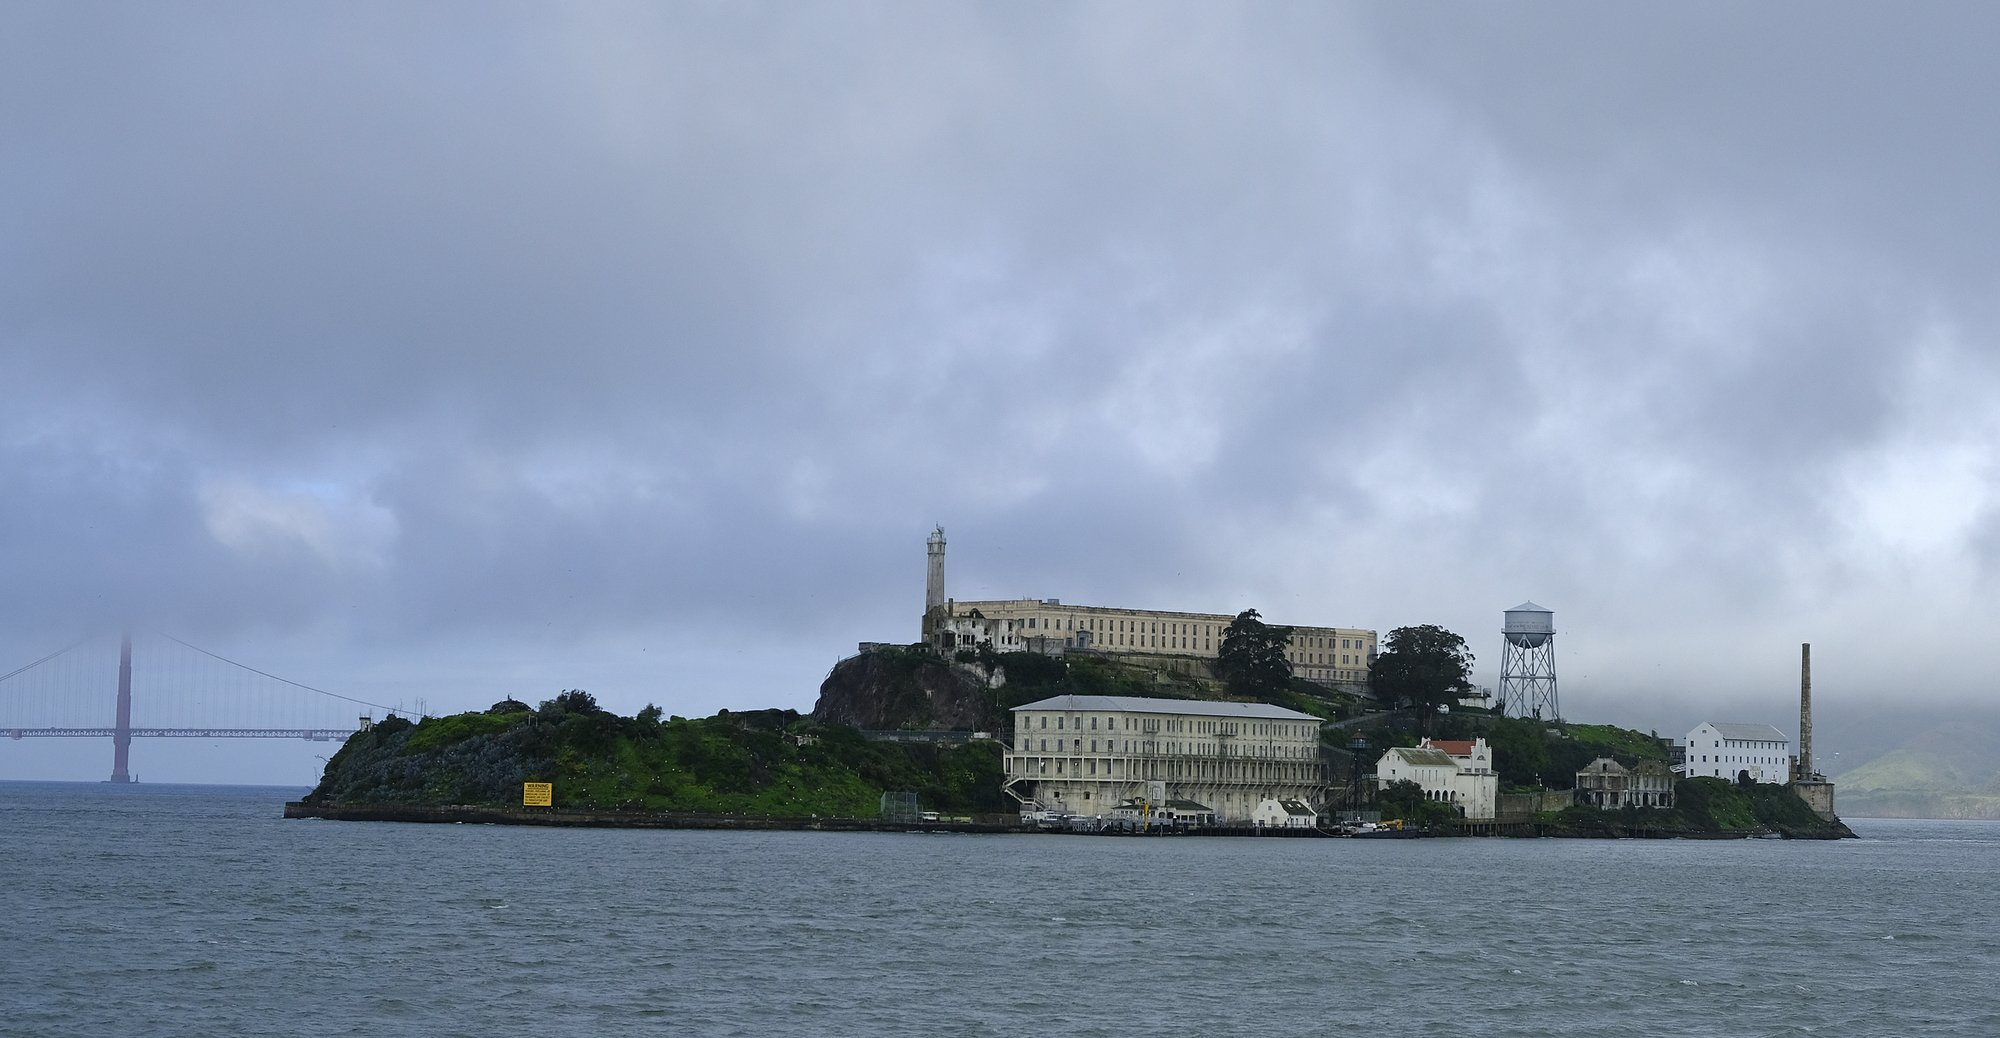 Archeologists find hidden tunnels below Alcatraz prison